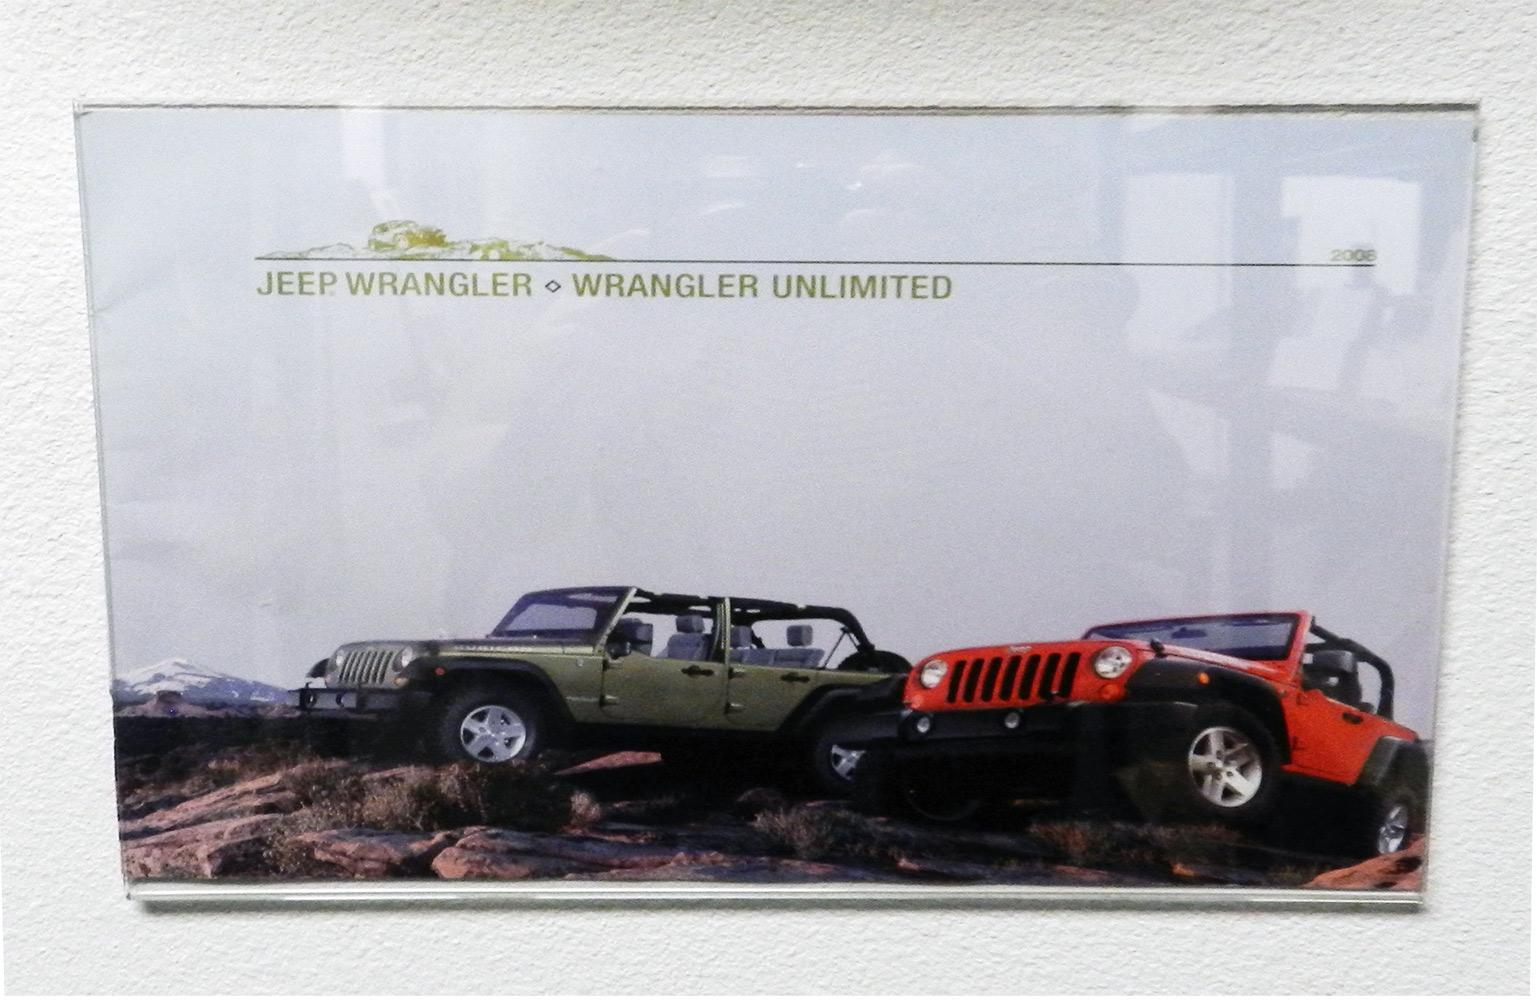 17 x 11 acrylic wall mount sign frame